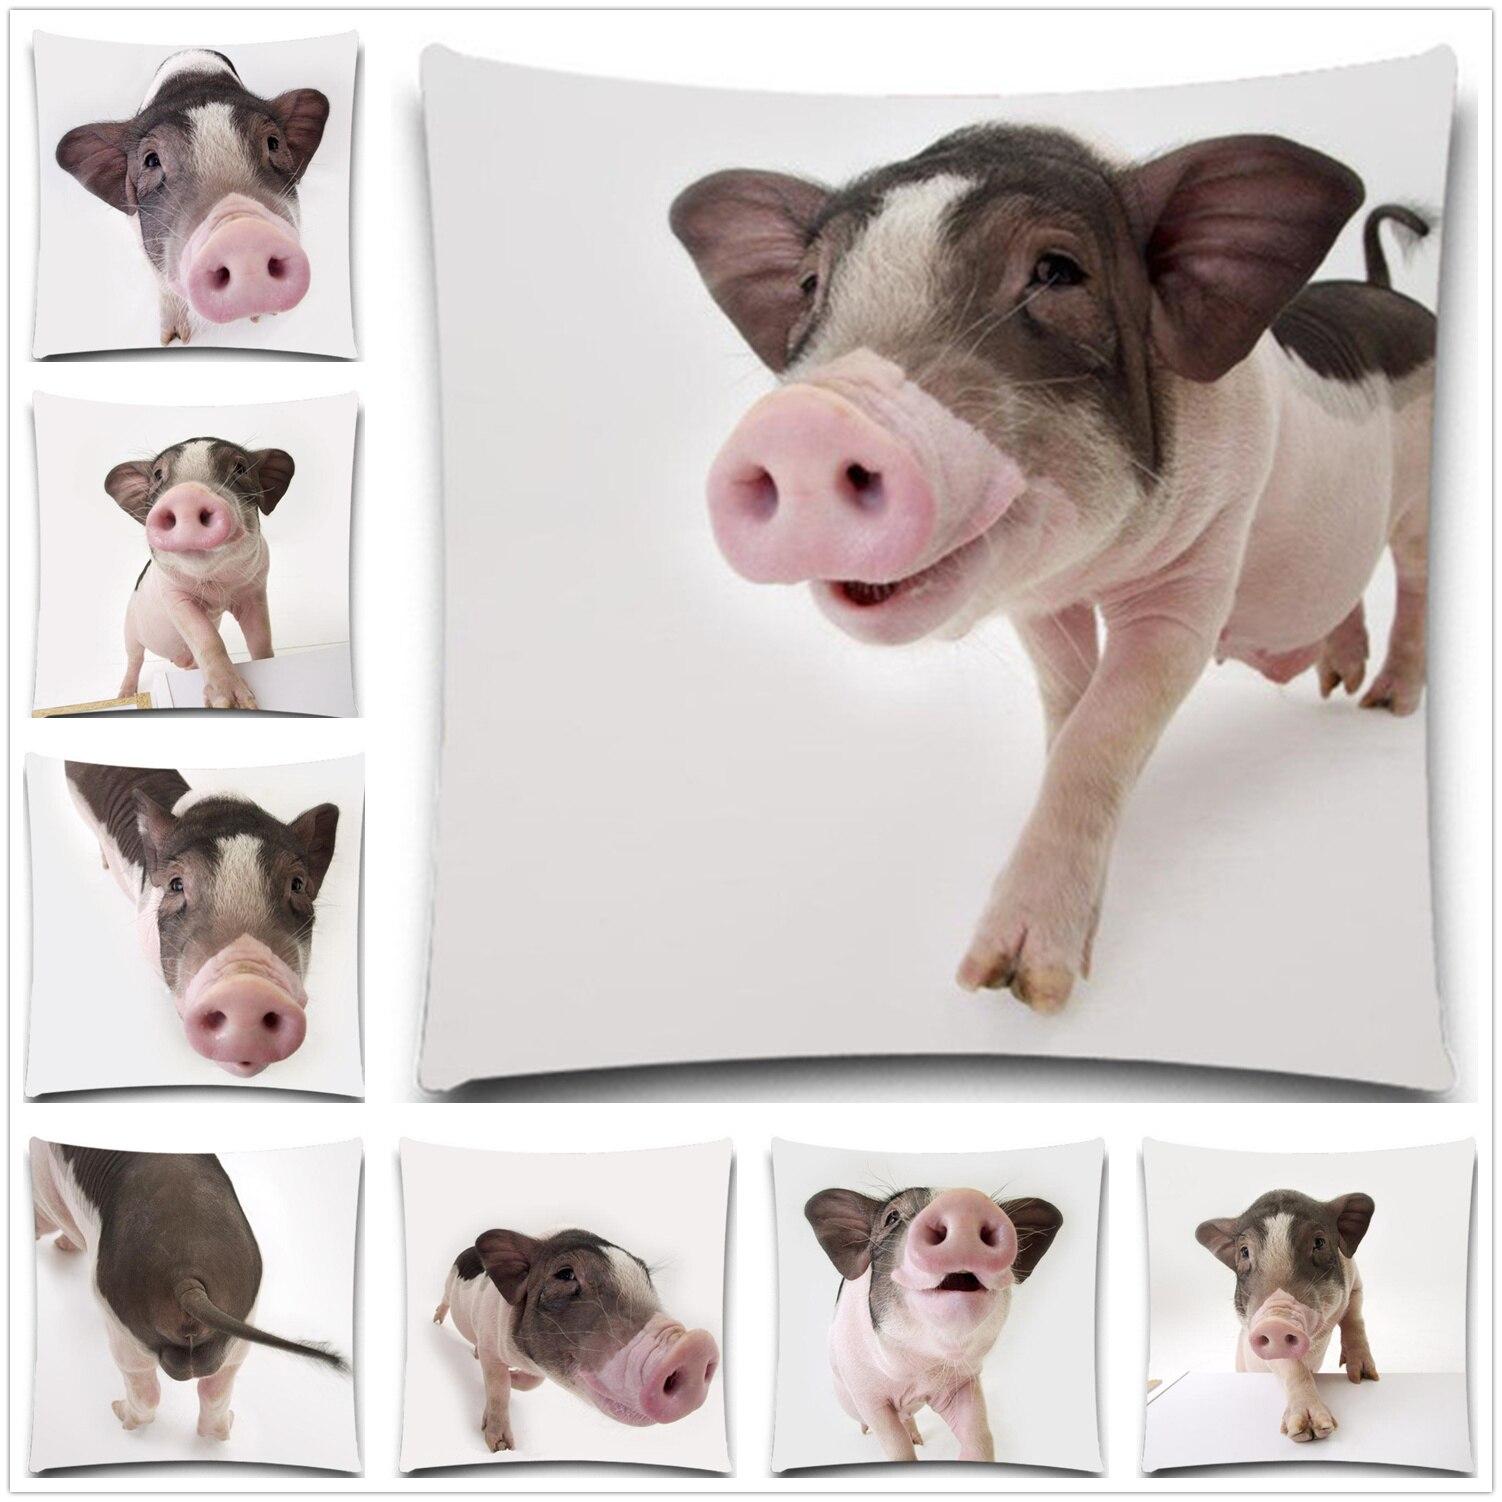 Babi di bawah lensa 2D cetak katun polyester sarung bantal kreatif Bantal kasus Persegi 5 ukuran 9 a